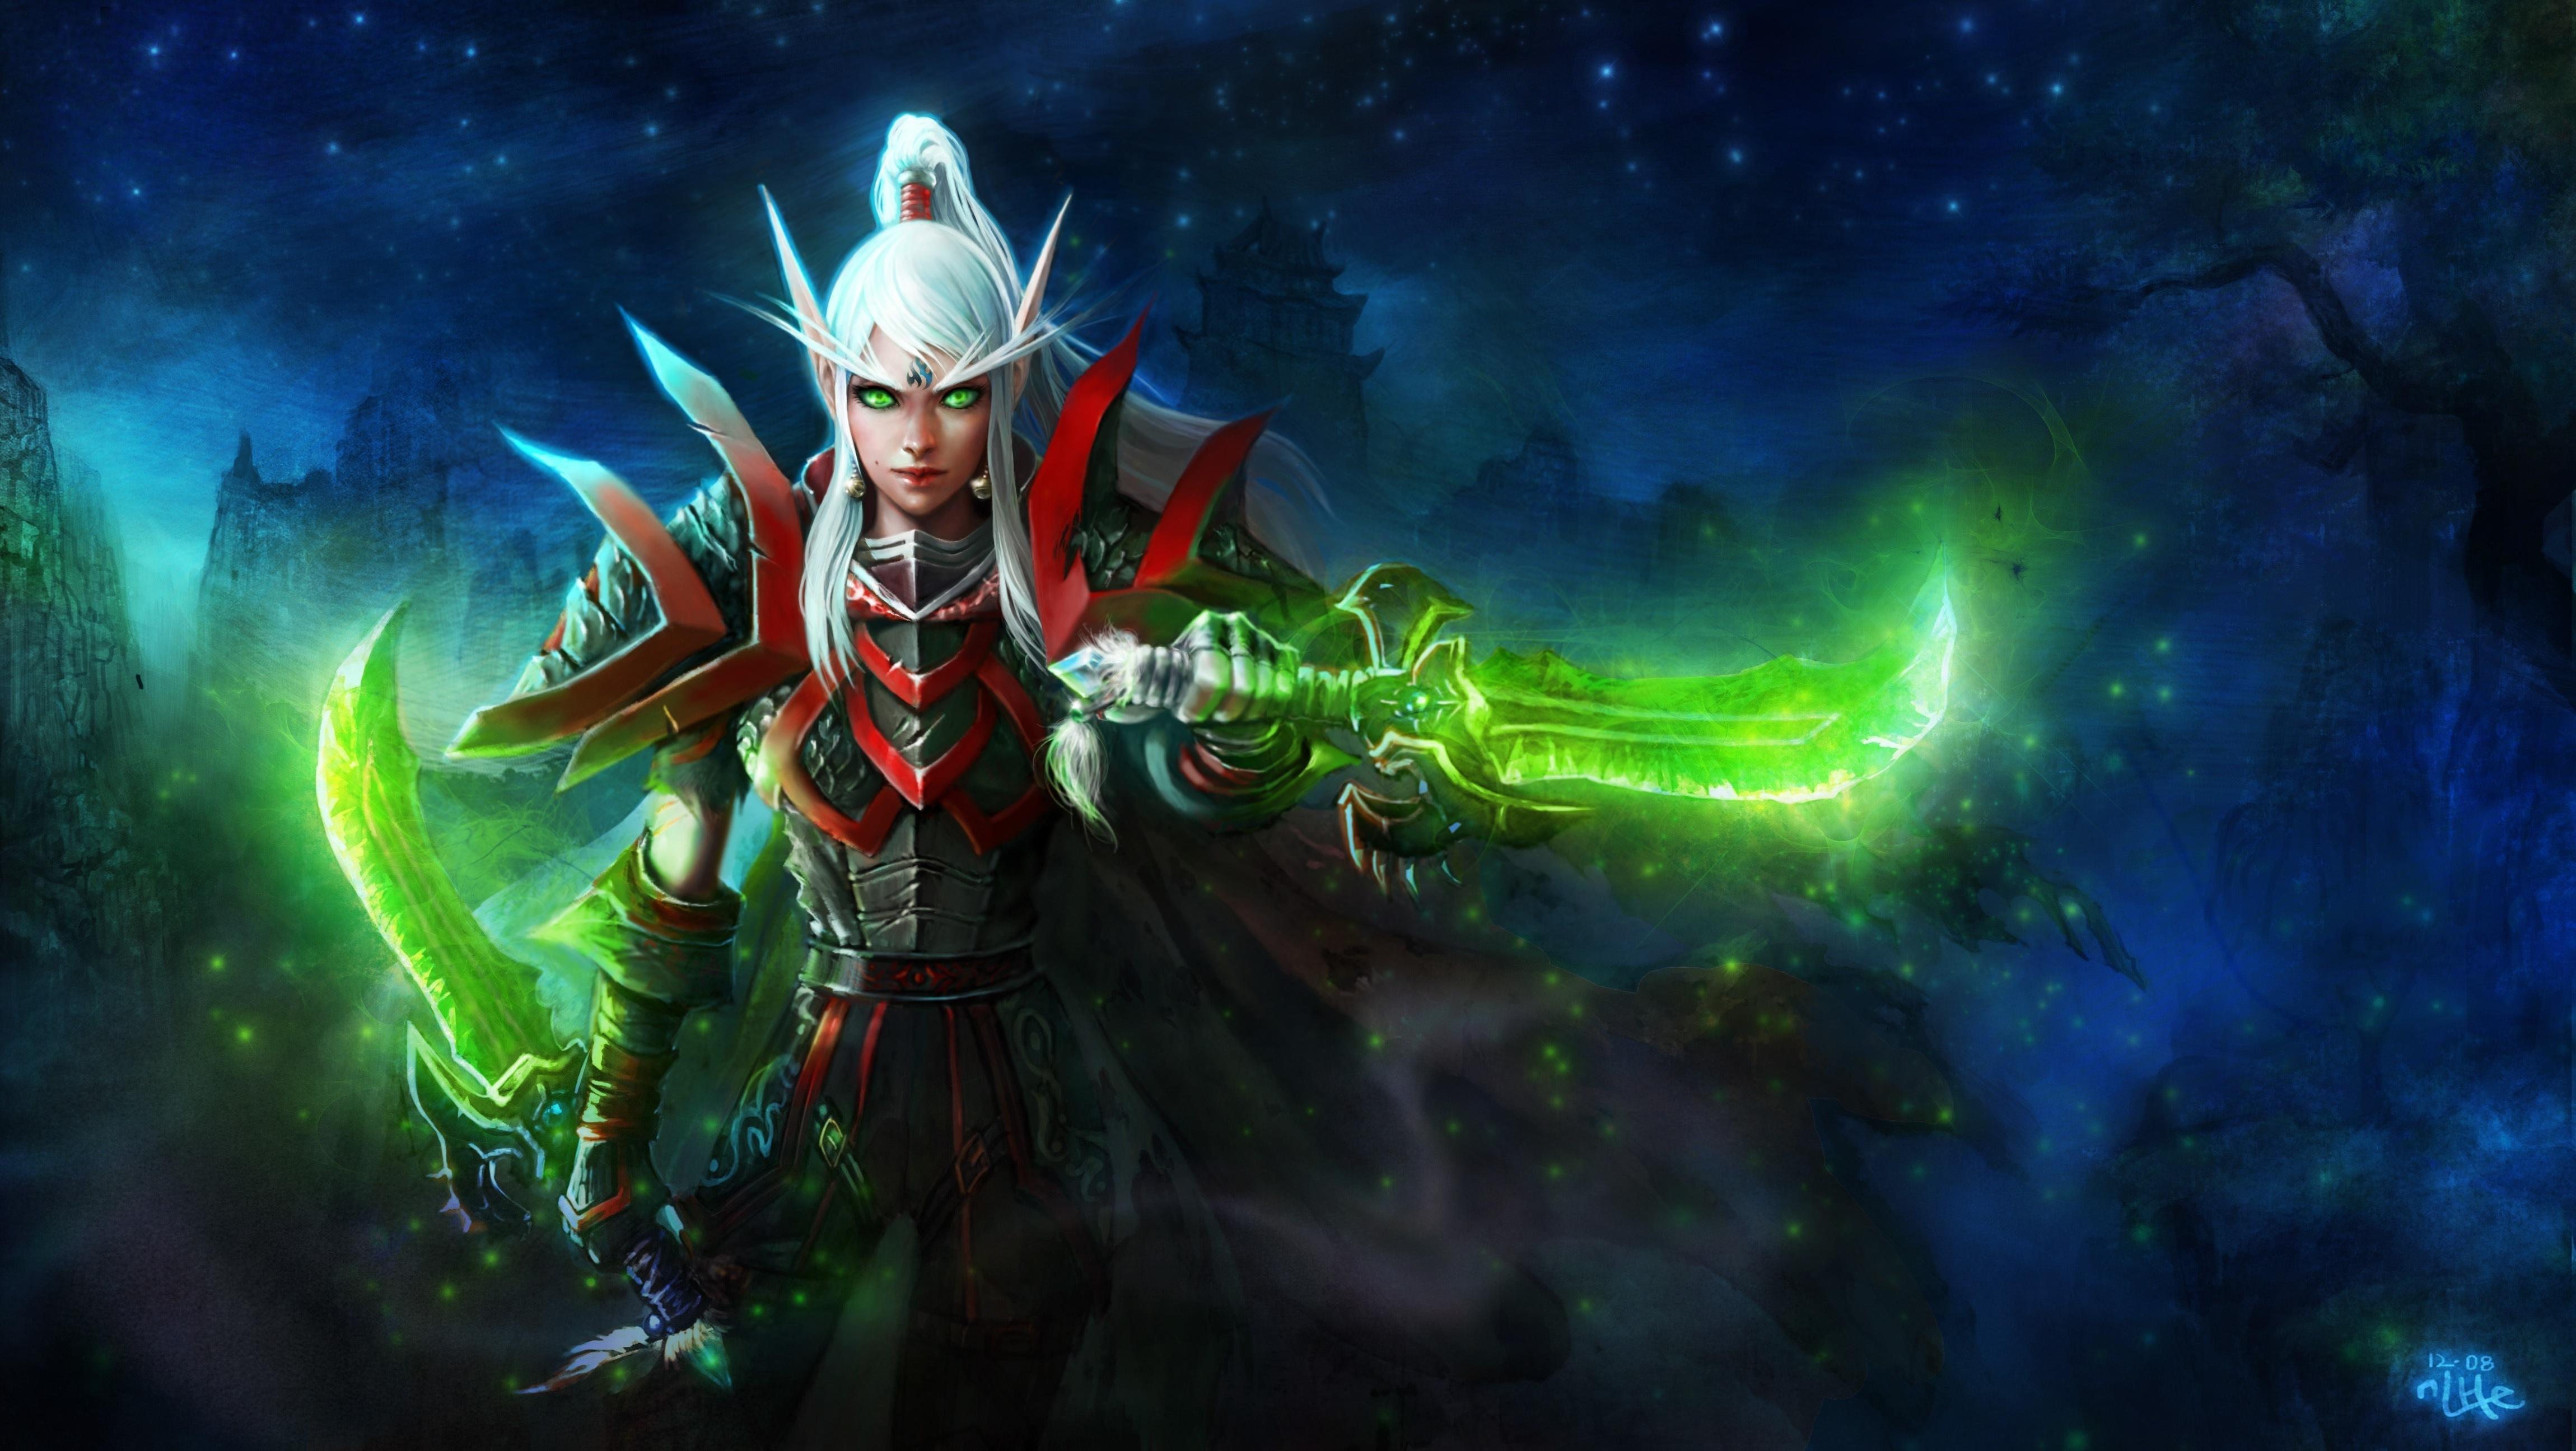 of WarCraft Warriors Elves Armor Games Fantasy Girls warrior wallpaper 4600x2591